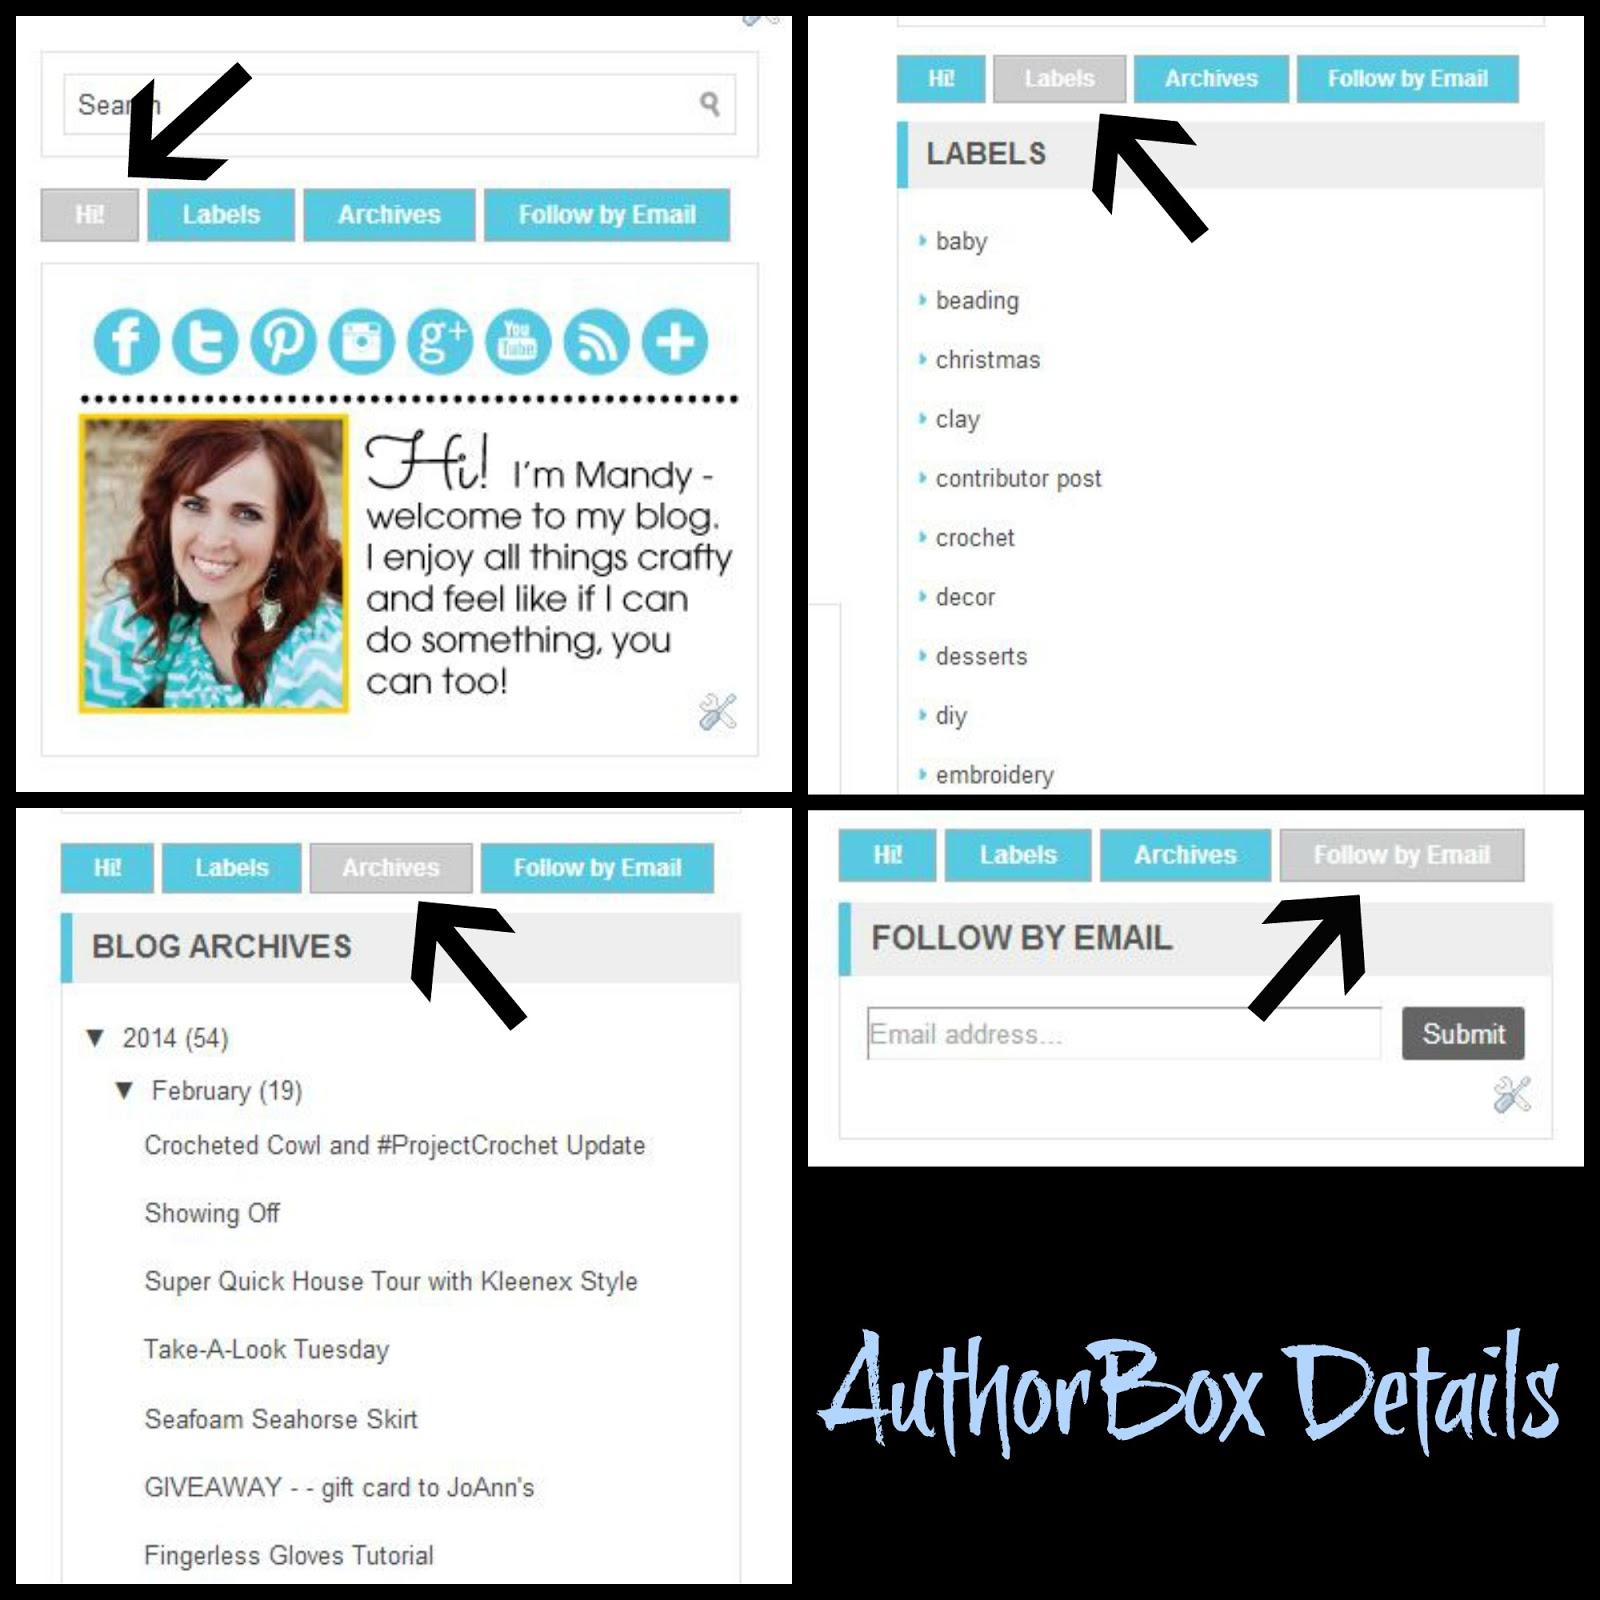 authorbox+details.jpg